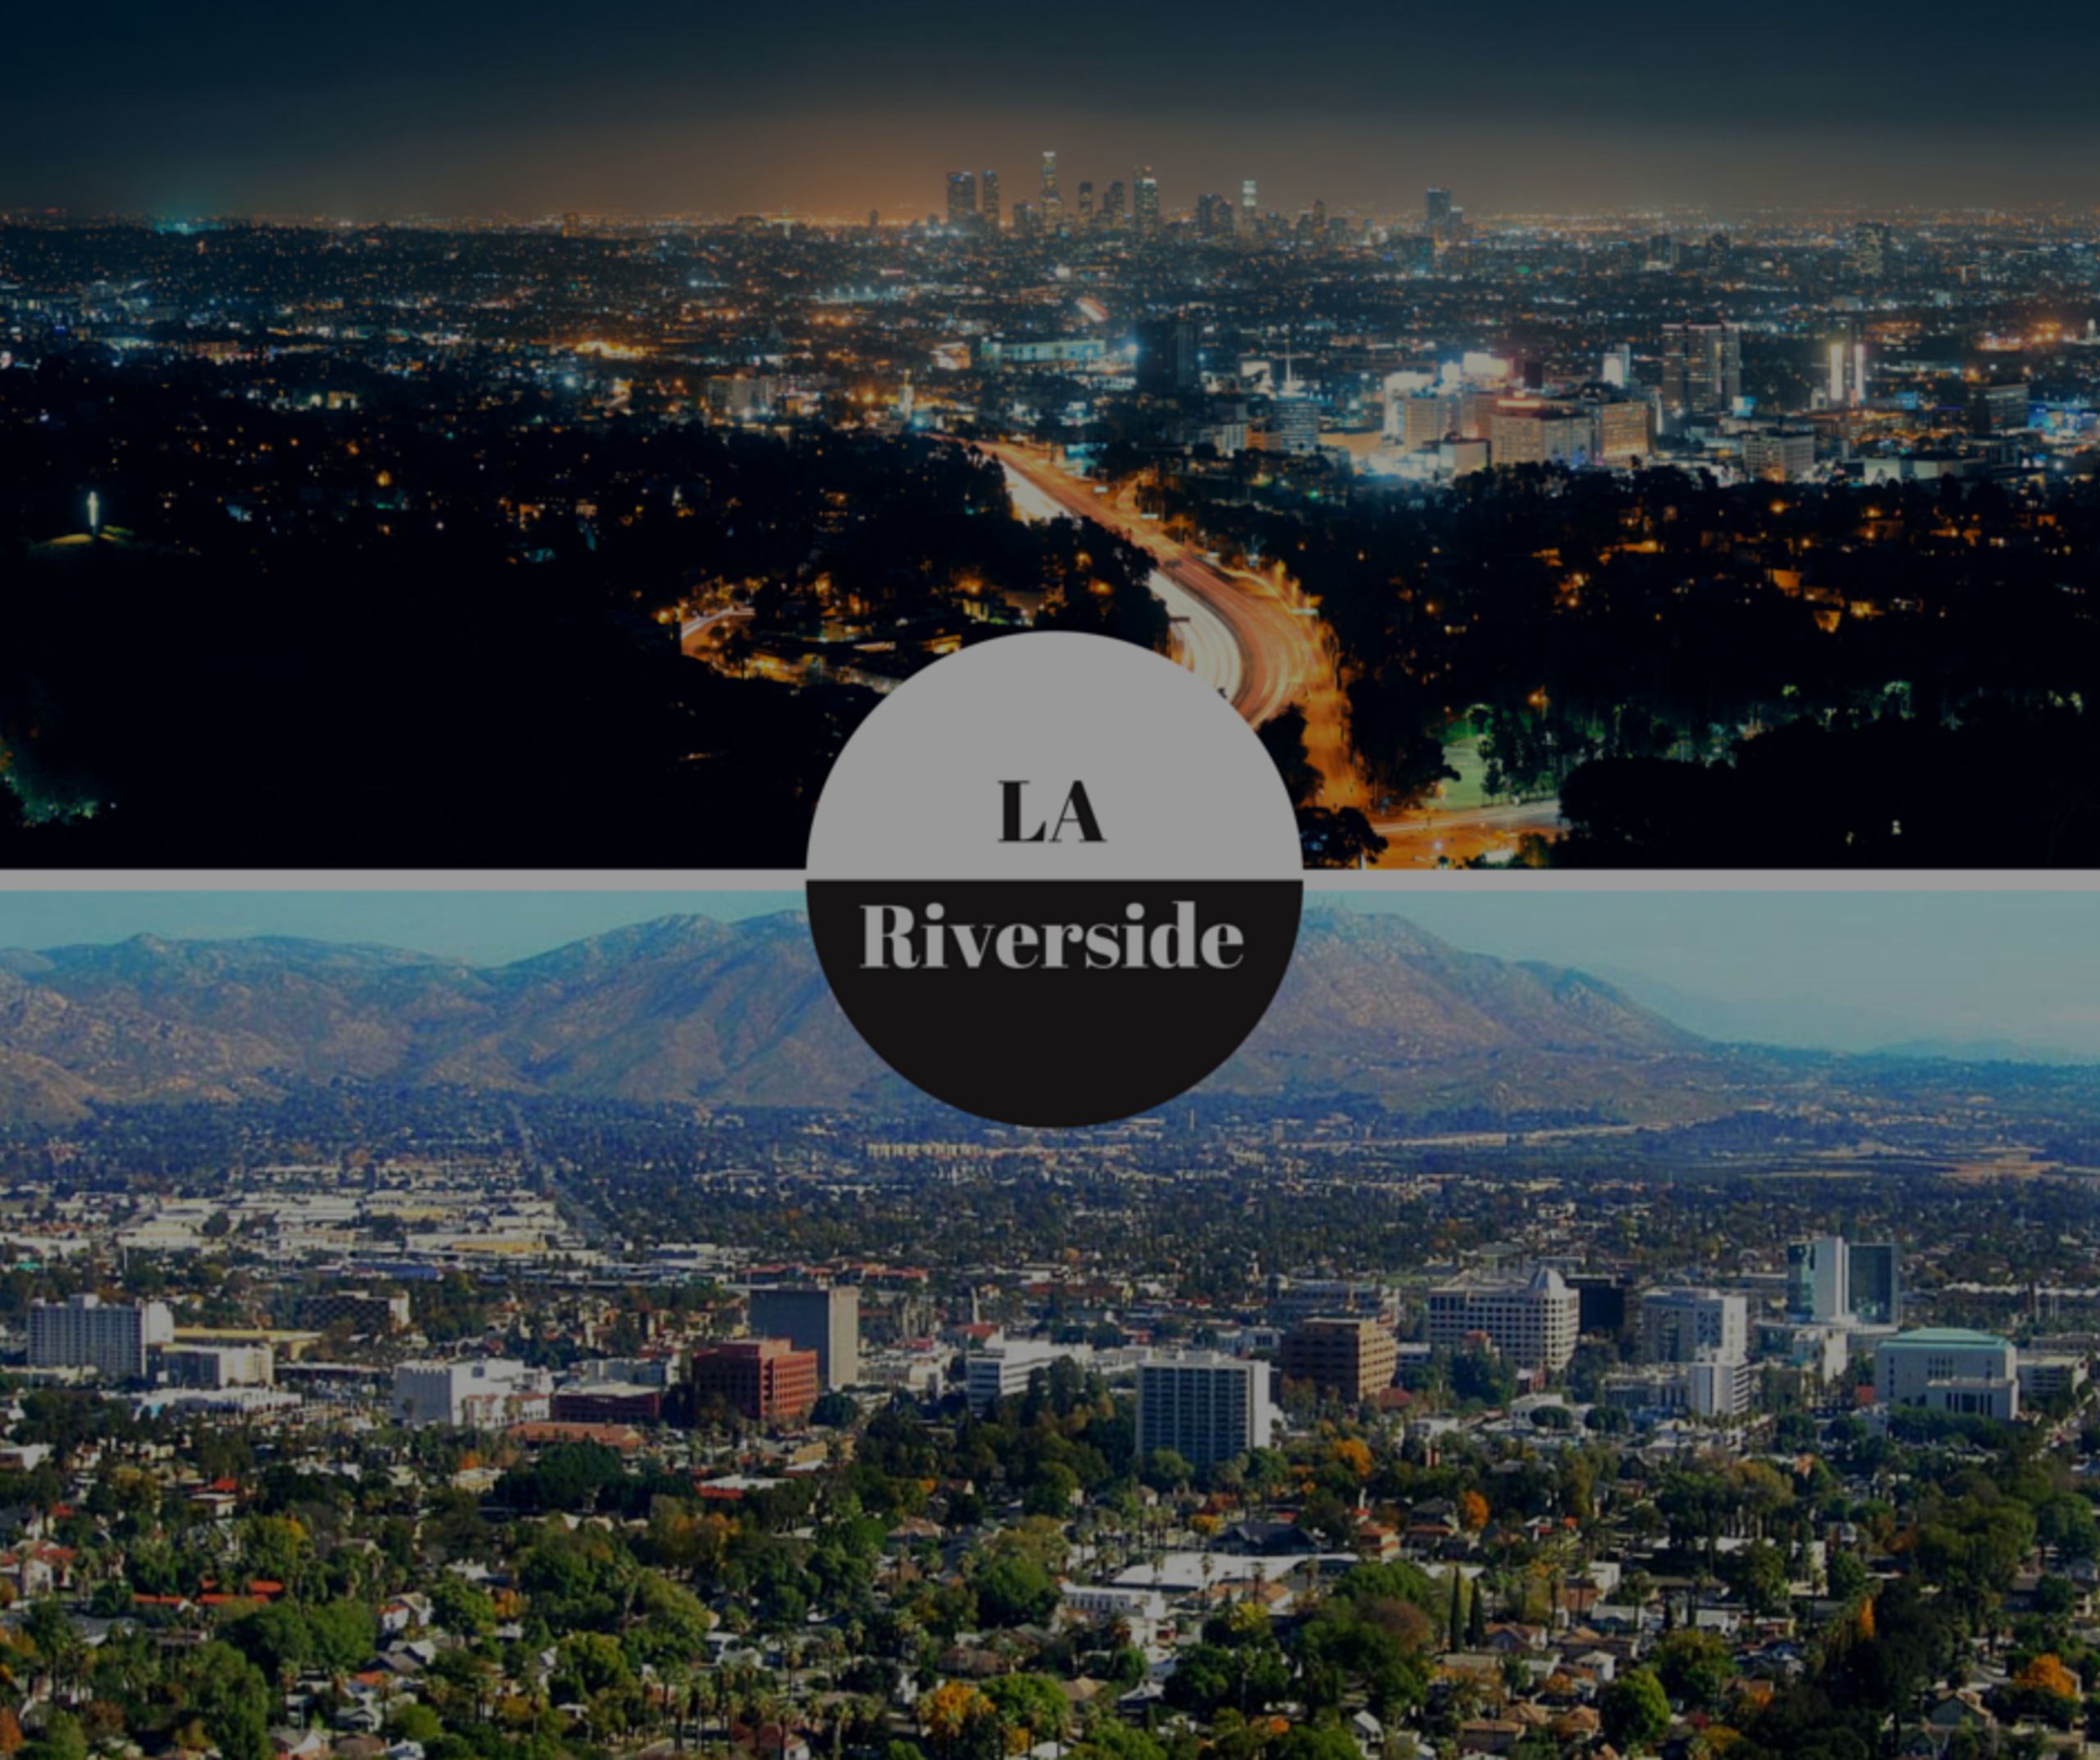 Riverside vs Los Angeles Showdown